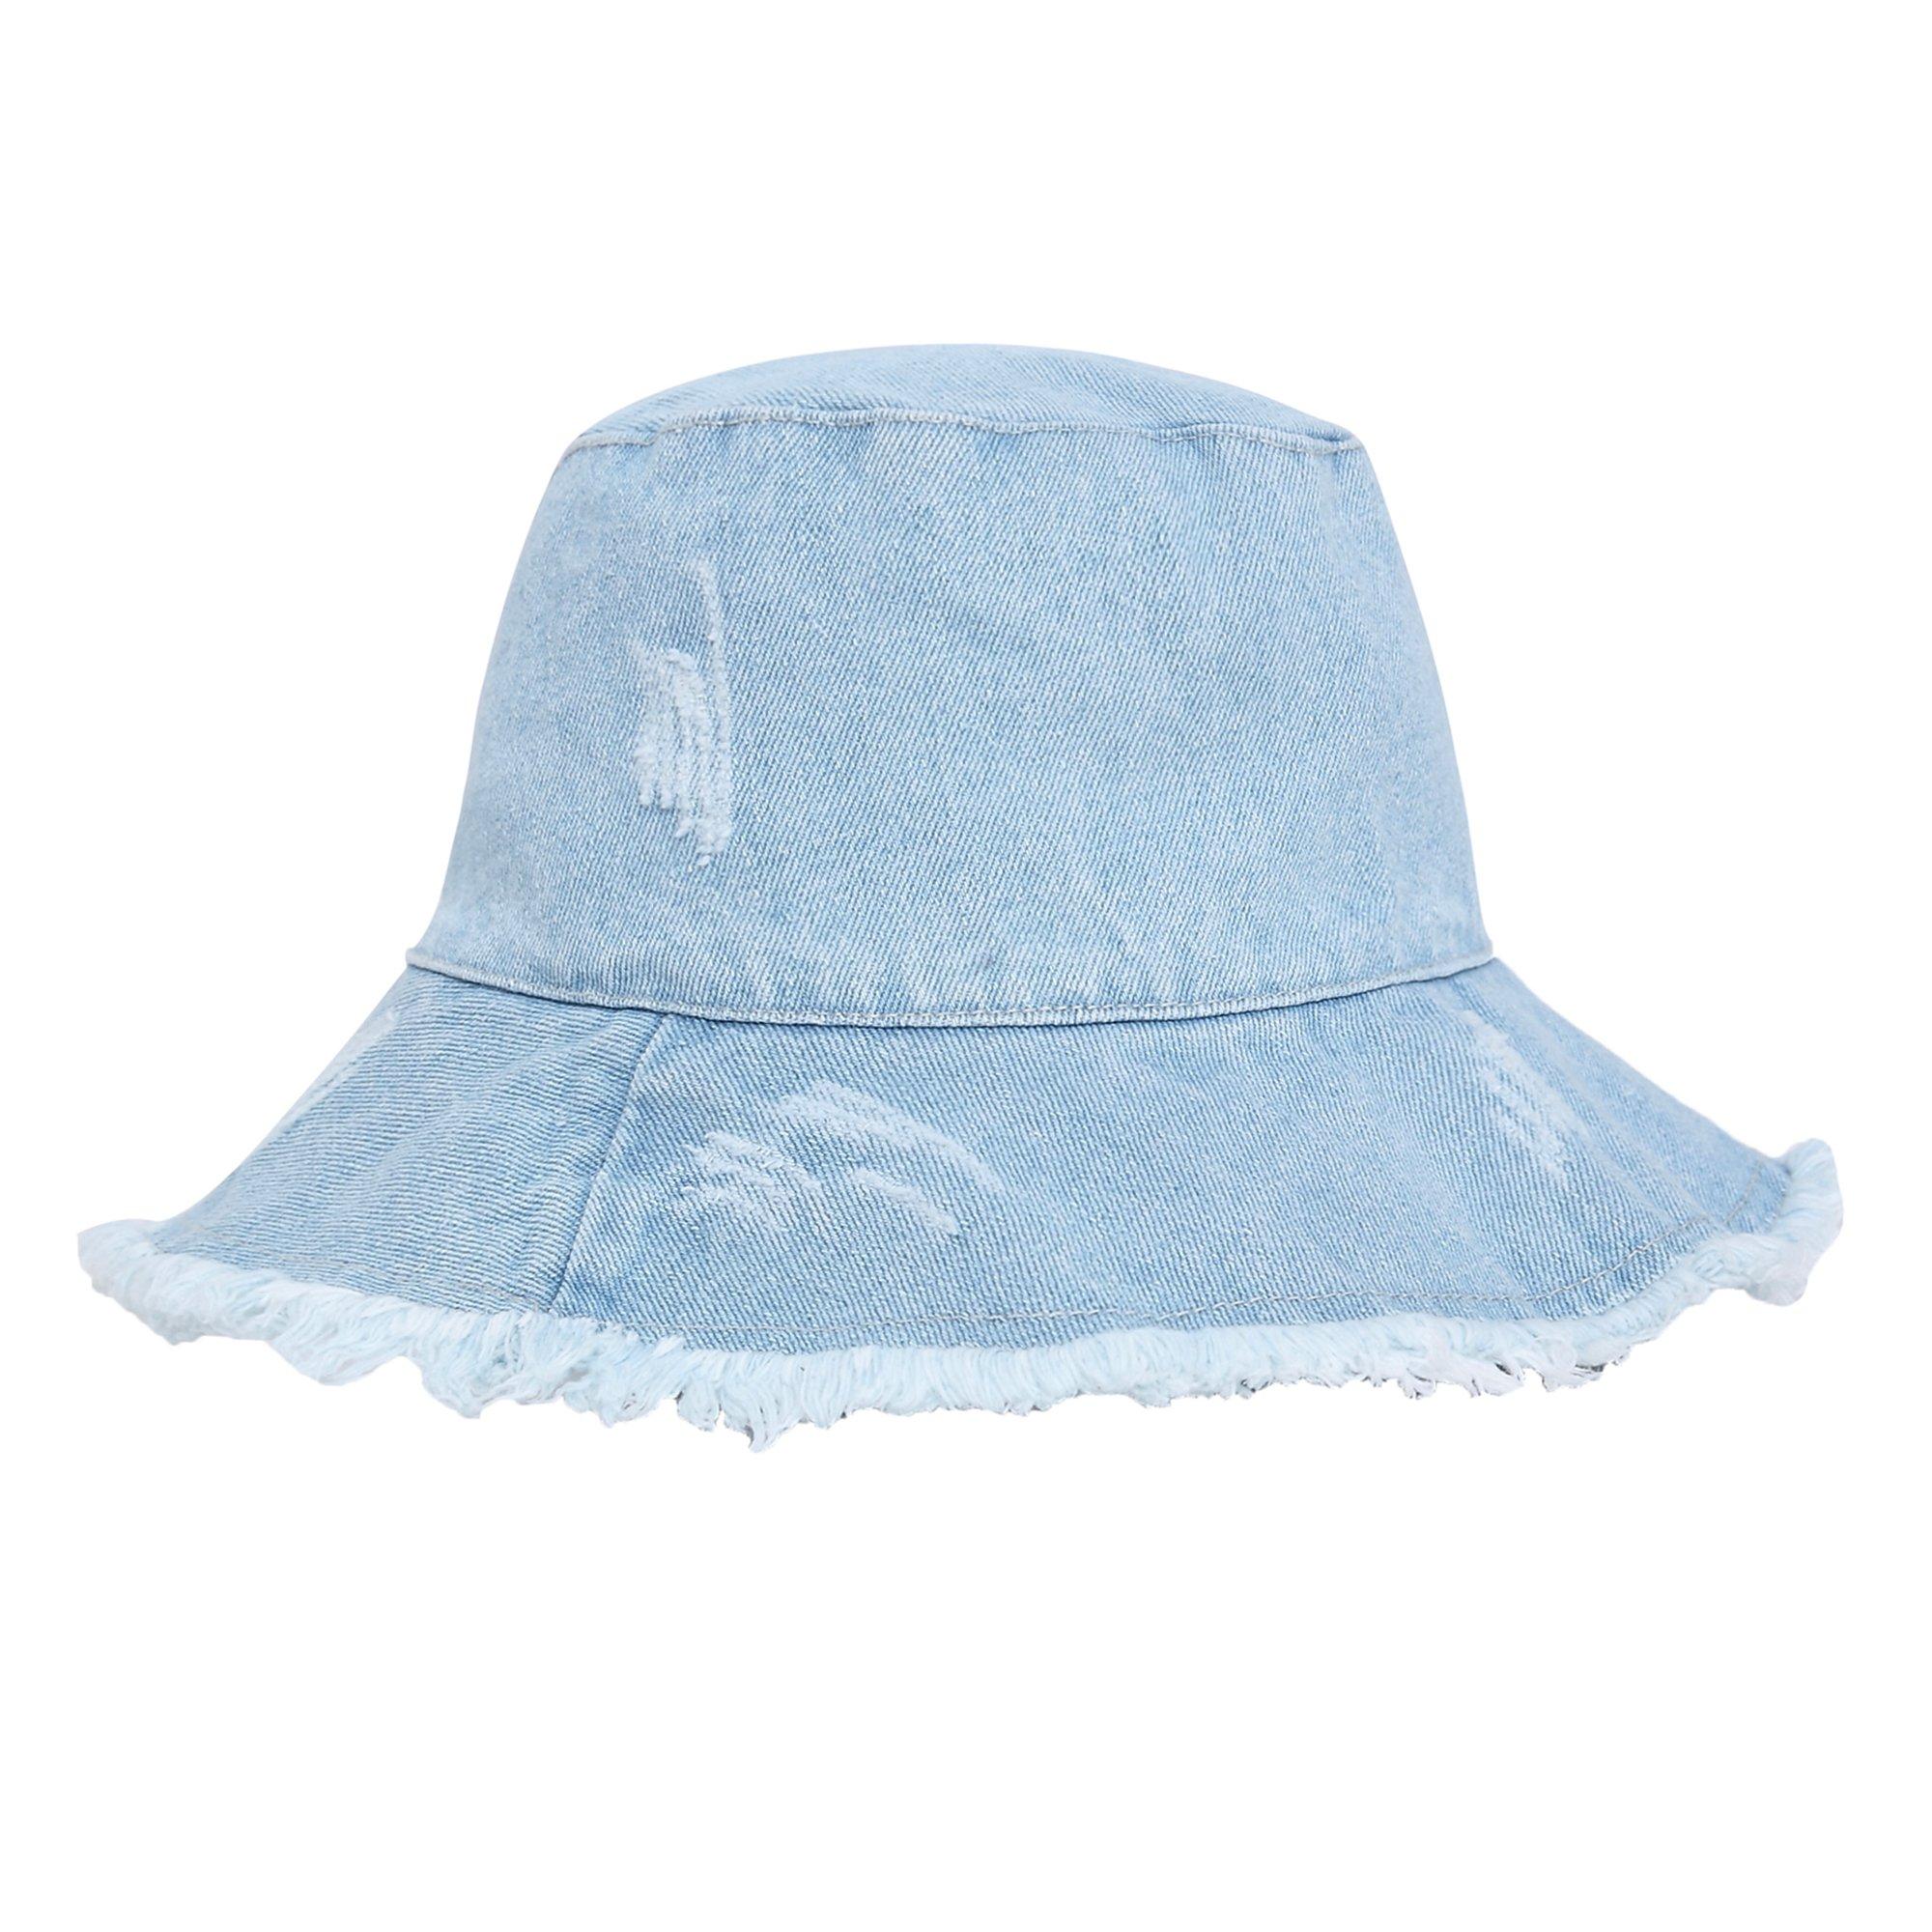 ZLYC Women Washed Cotton Denim Bucket Hats caps (Light Blue)